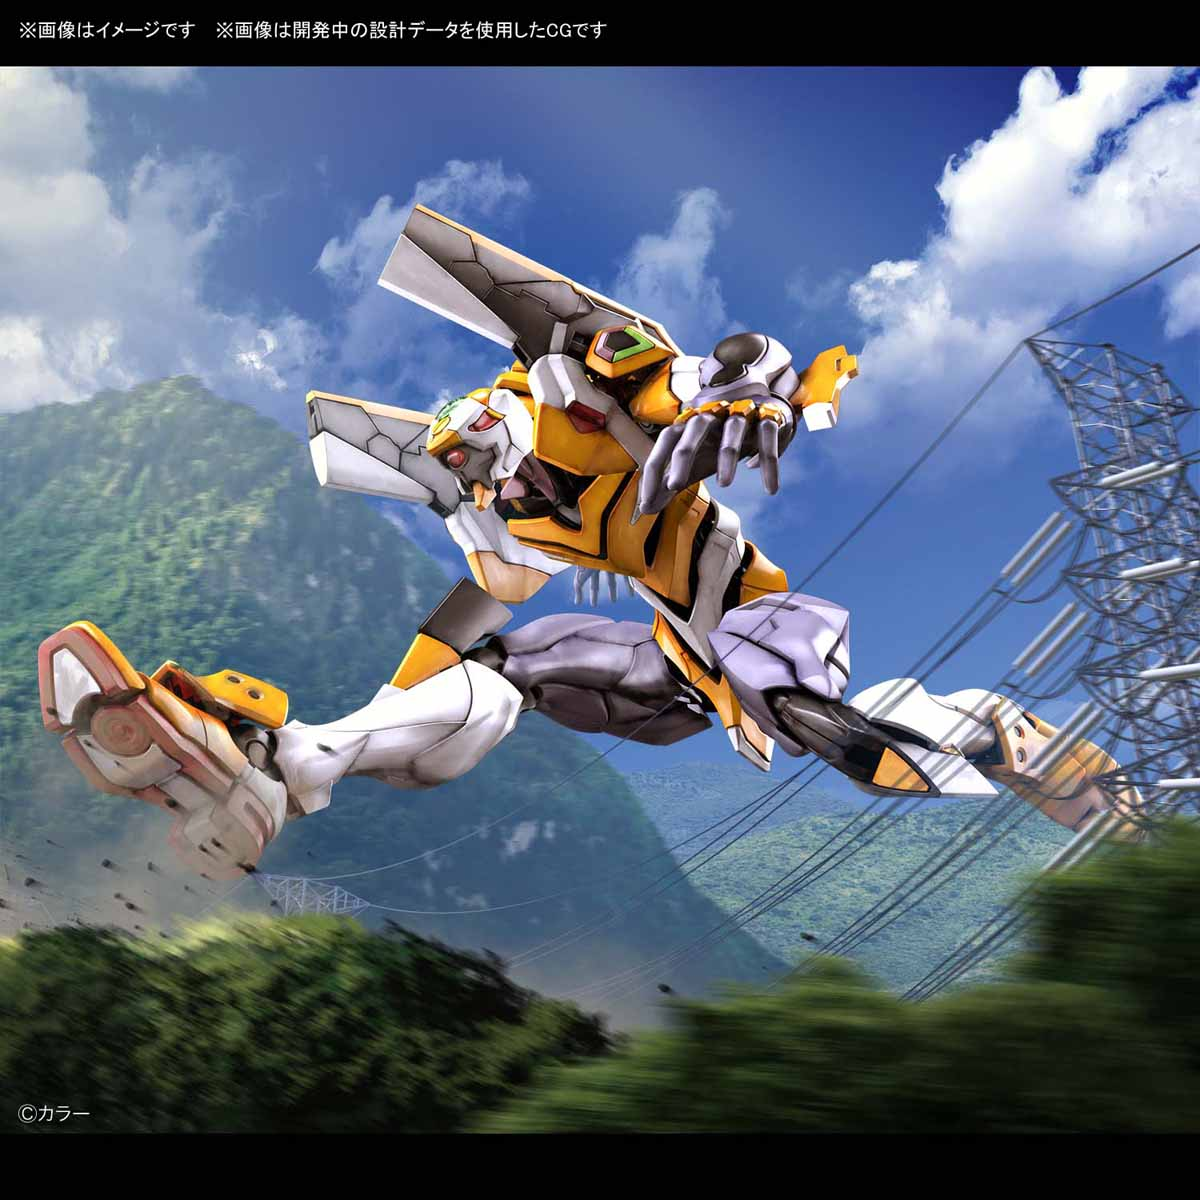 RG『汎用ヒト型決戦兵器 人造人間エヴァンゲリオン試作零号機』プラモデル-001